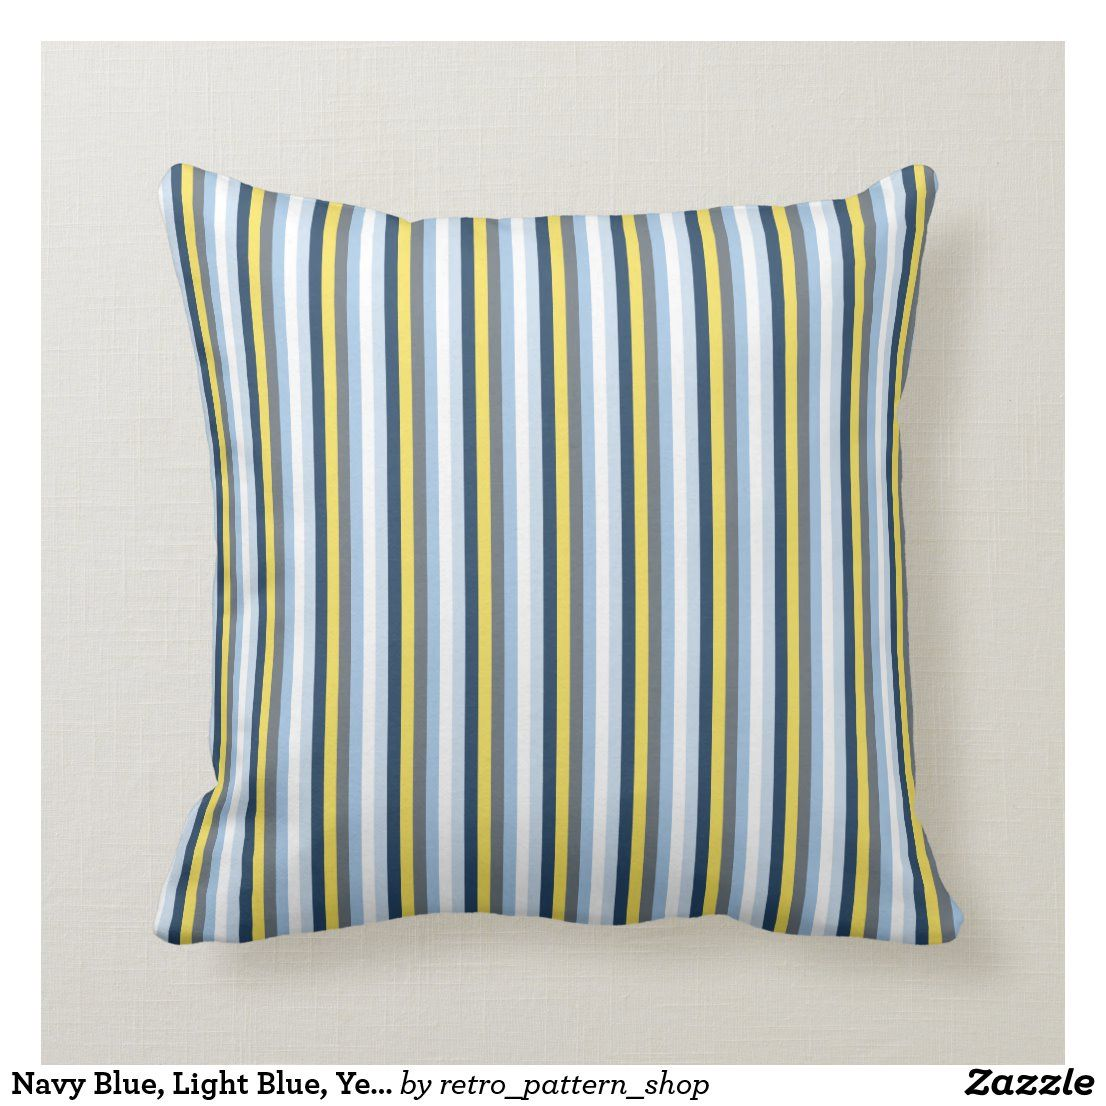 Navy Blue Light Blue Yellow And Gray Stripes Throw Pillow Zazzle Com In 2020 Stripe Throw Pillow Striped Throw Throw Pillows